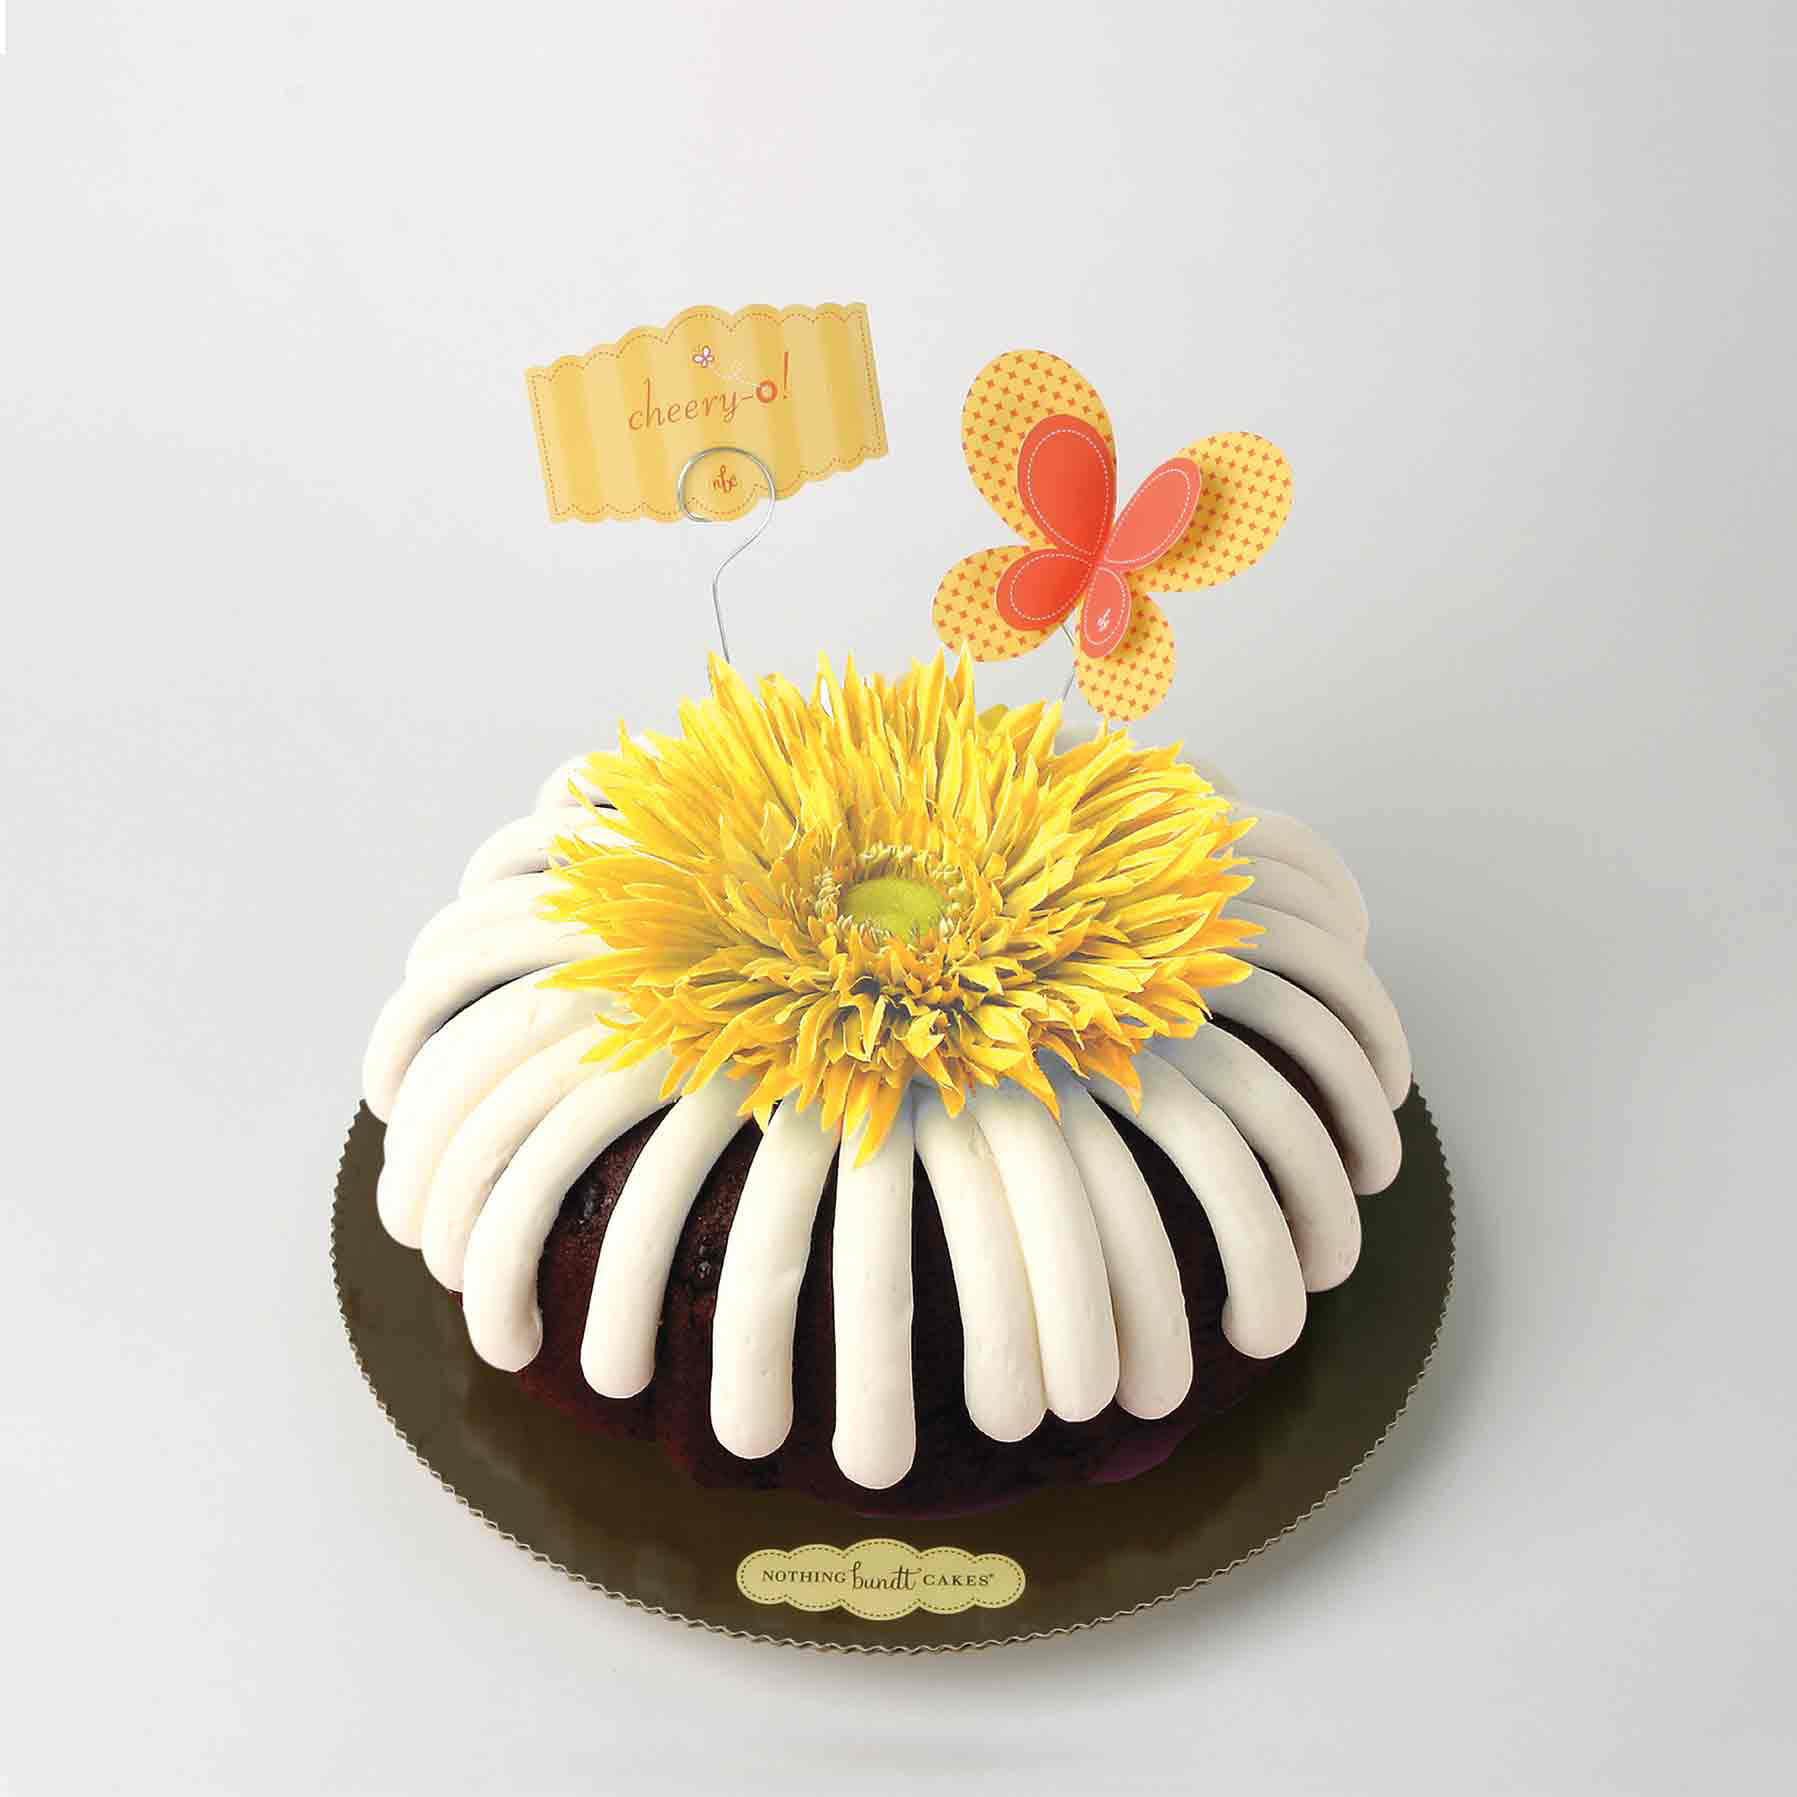 nothing-bundt-cakes-cheer-themed-cake